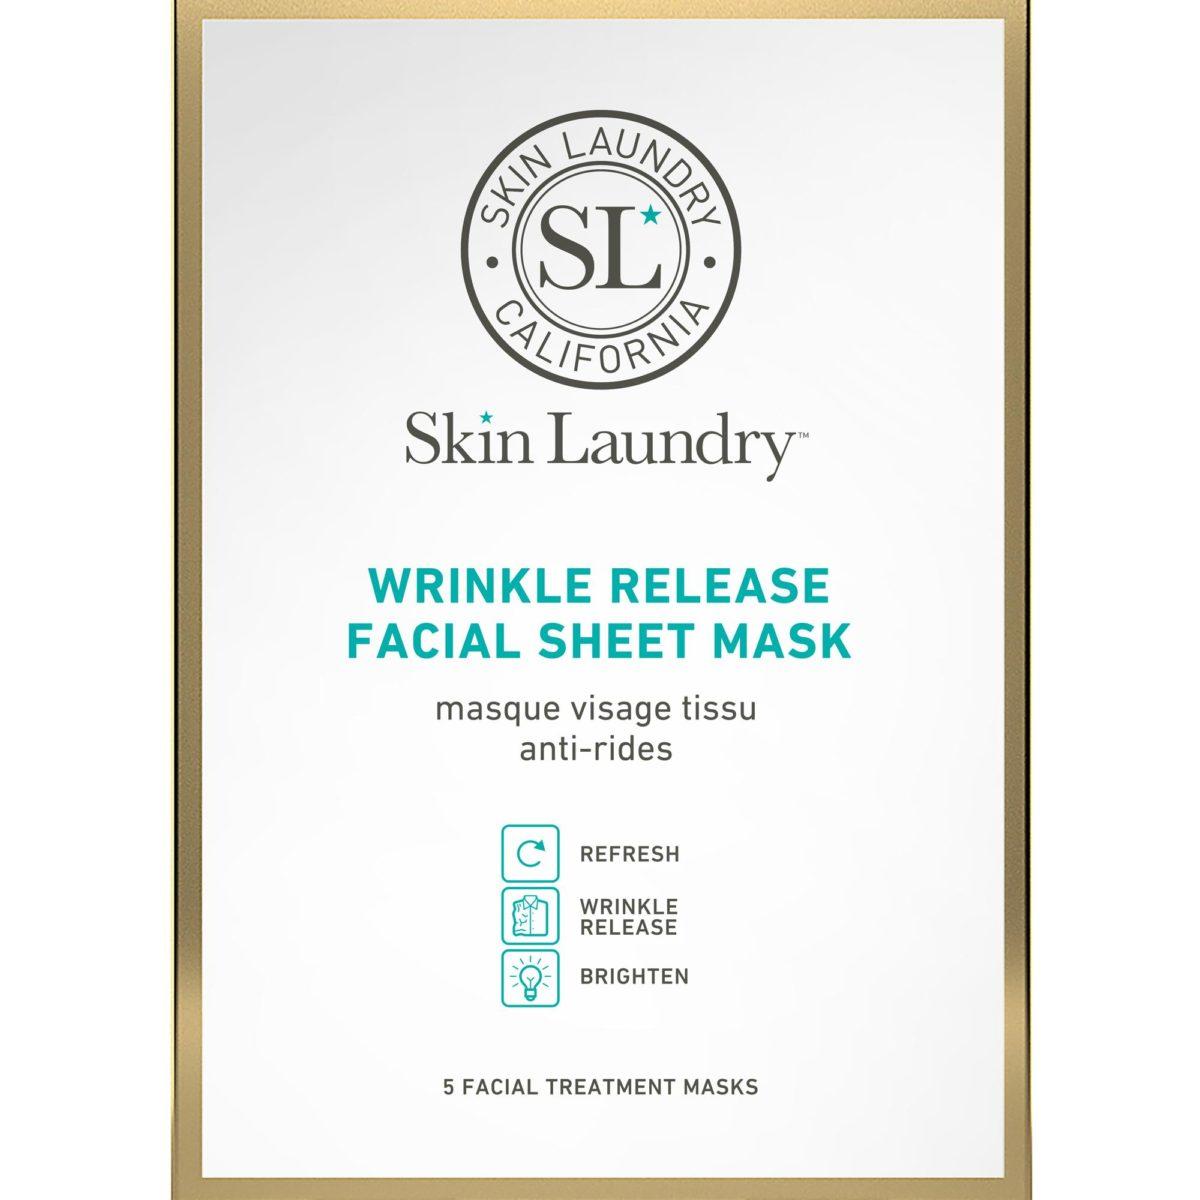 Skin Laundry Wrinkle Release Facial Sheet Mask